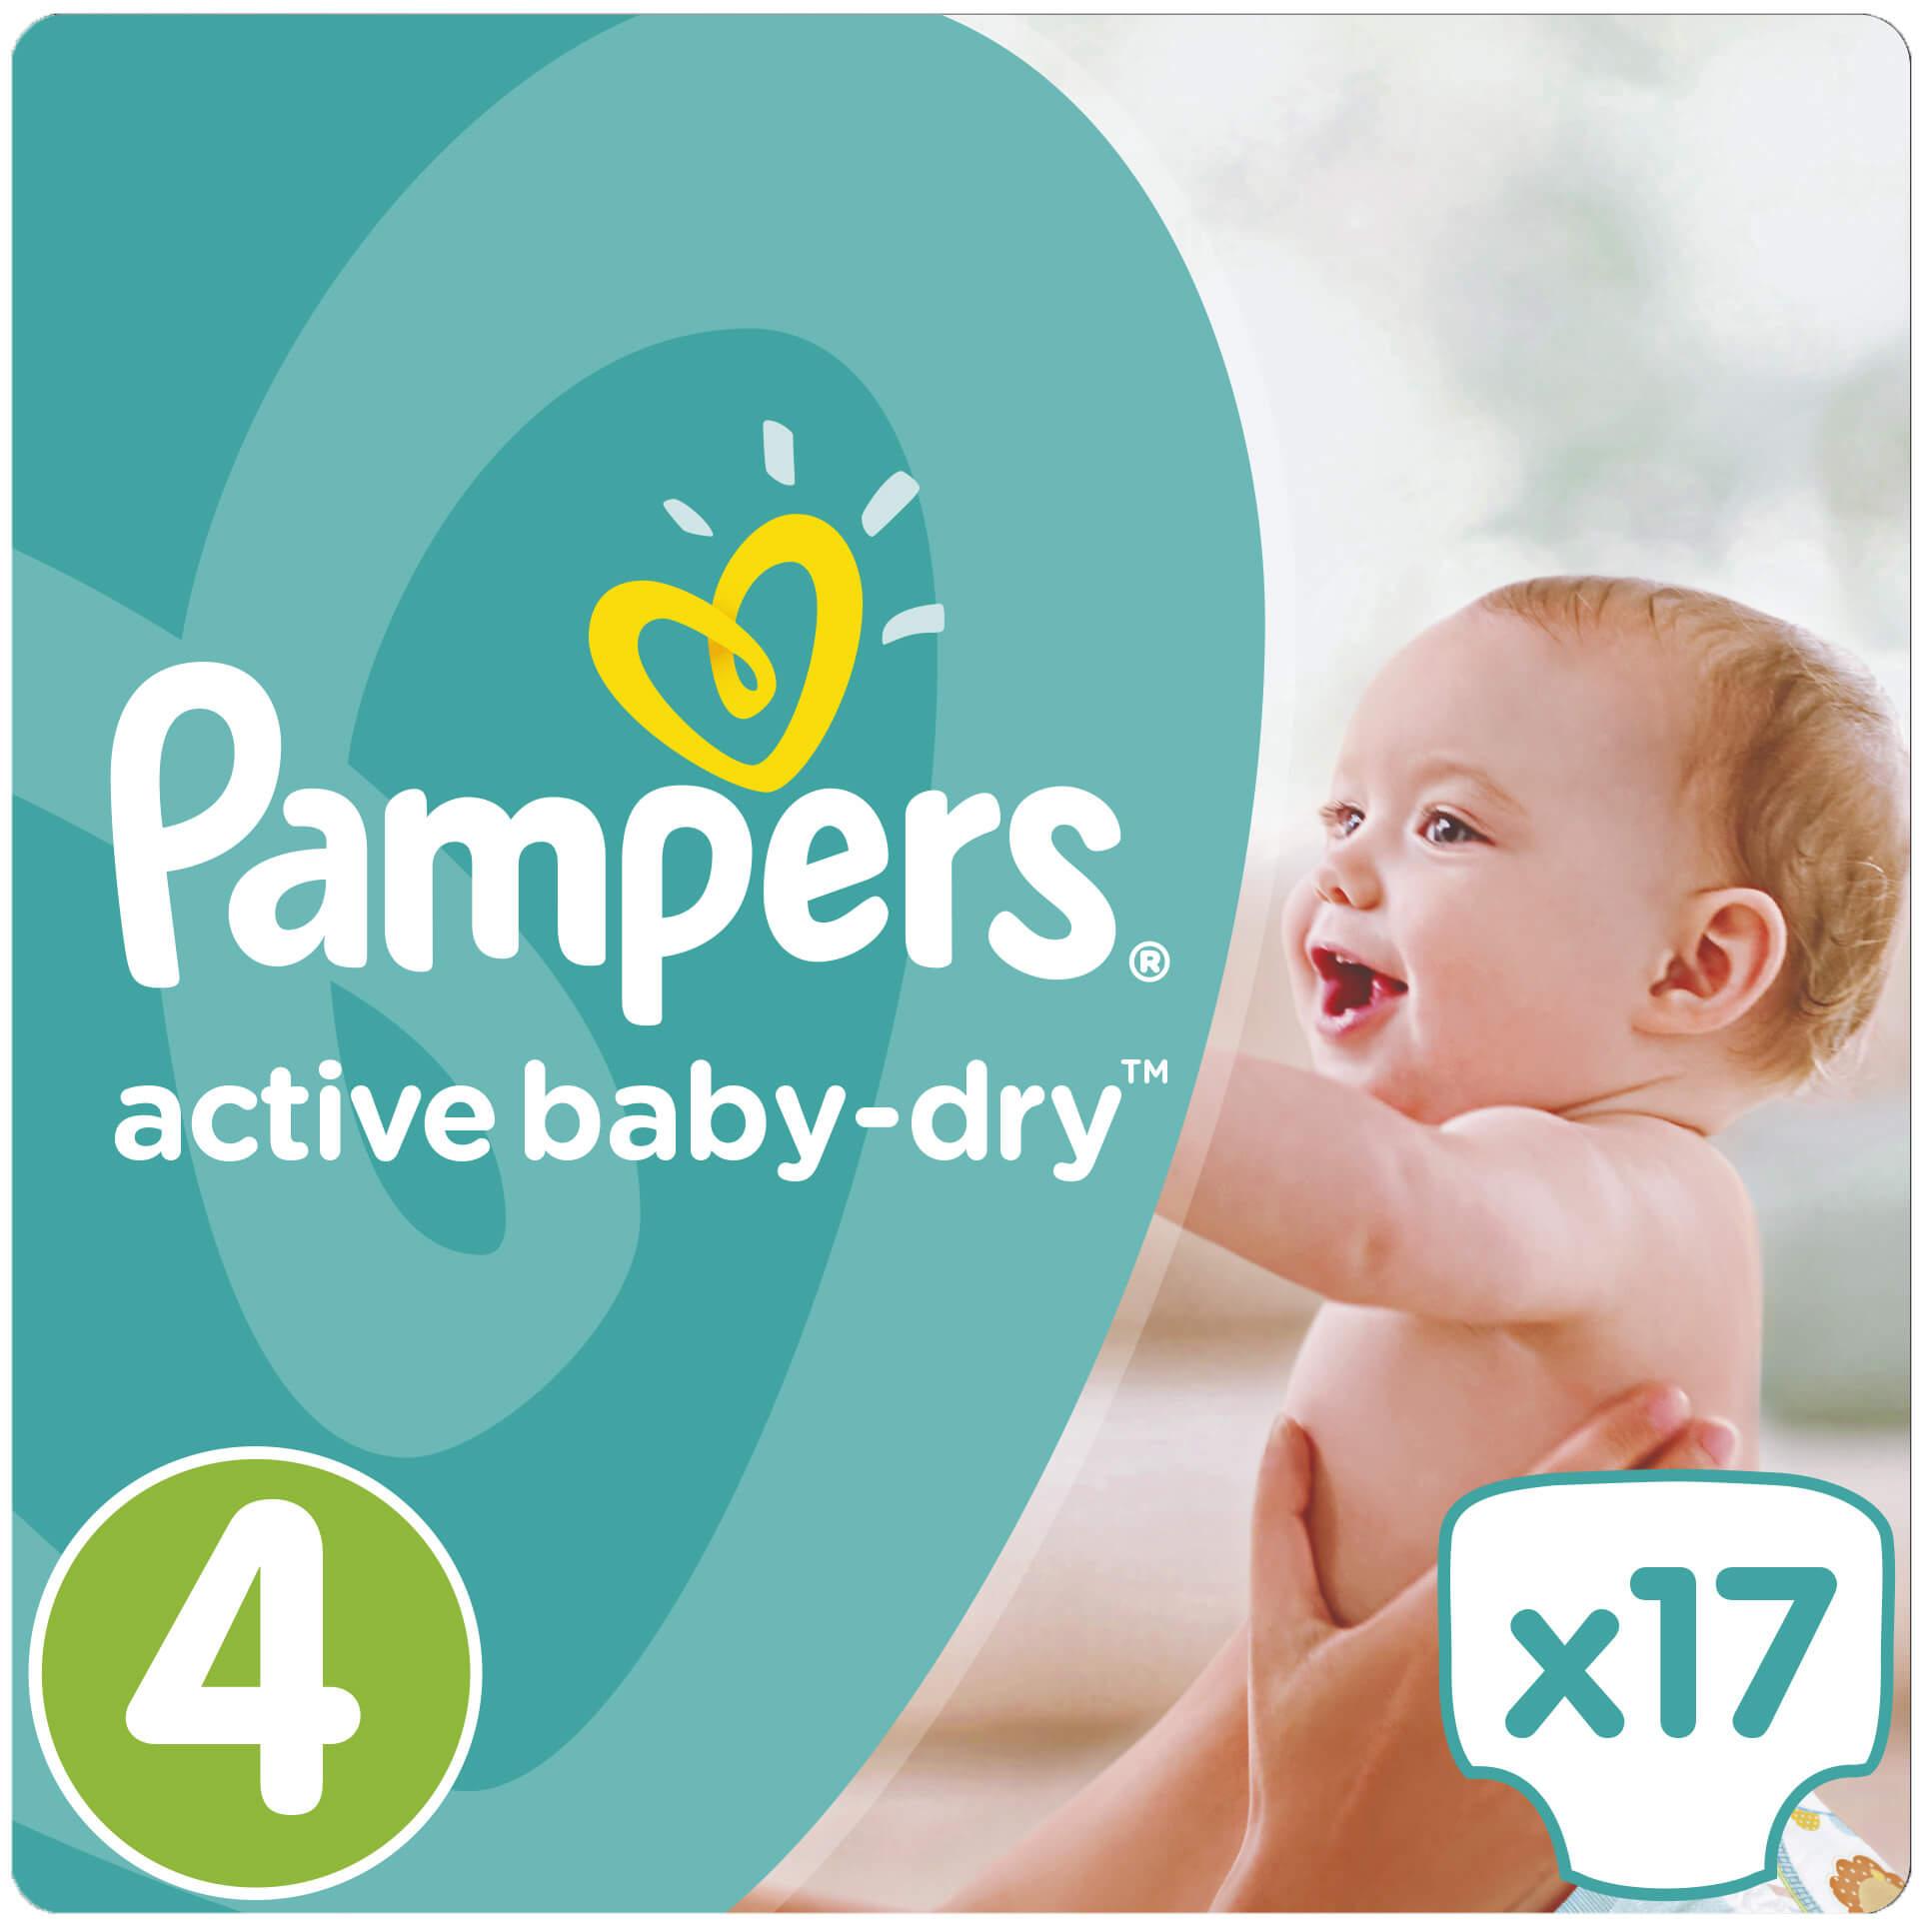 Pampers Active Baby Dry No4 (8-14kg) 17πάνες μητέρα παιδί   περιποίηση για το μωρό   πάνες για το μωρό